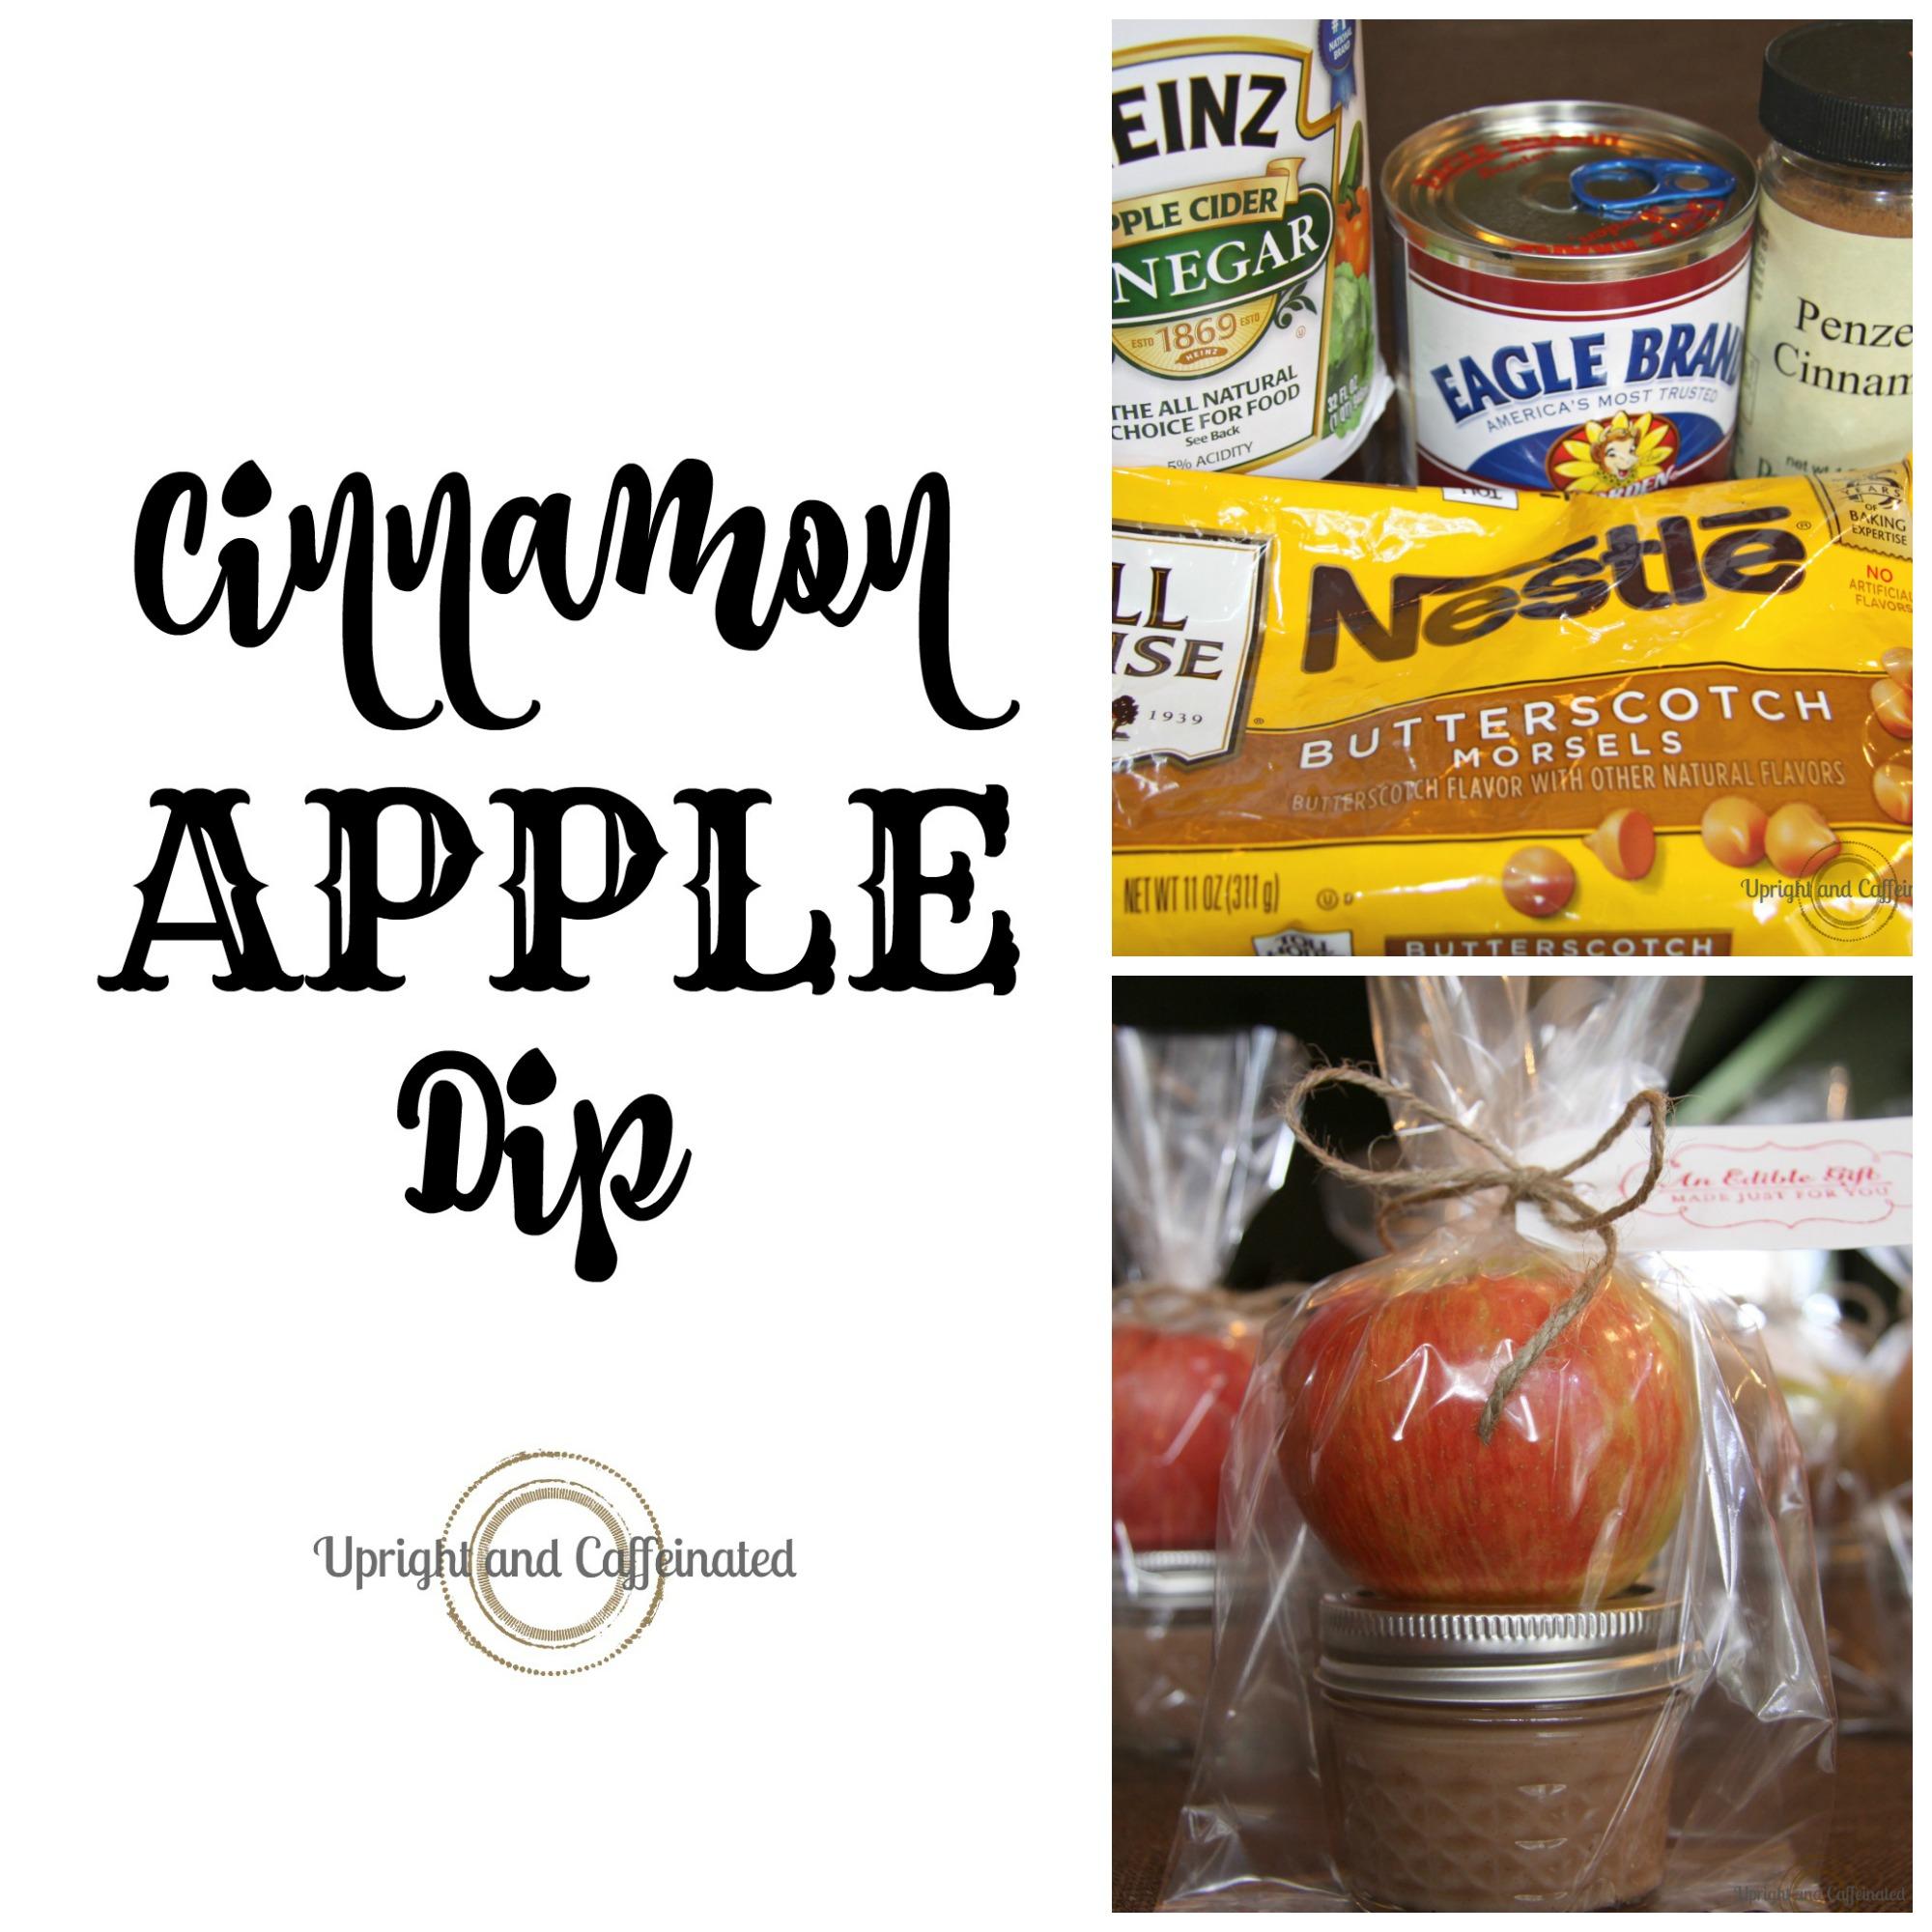 Cinnamon Apple Dip: A Simple Homemade Gift